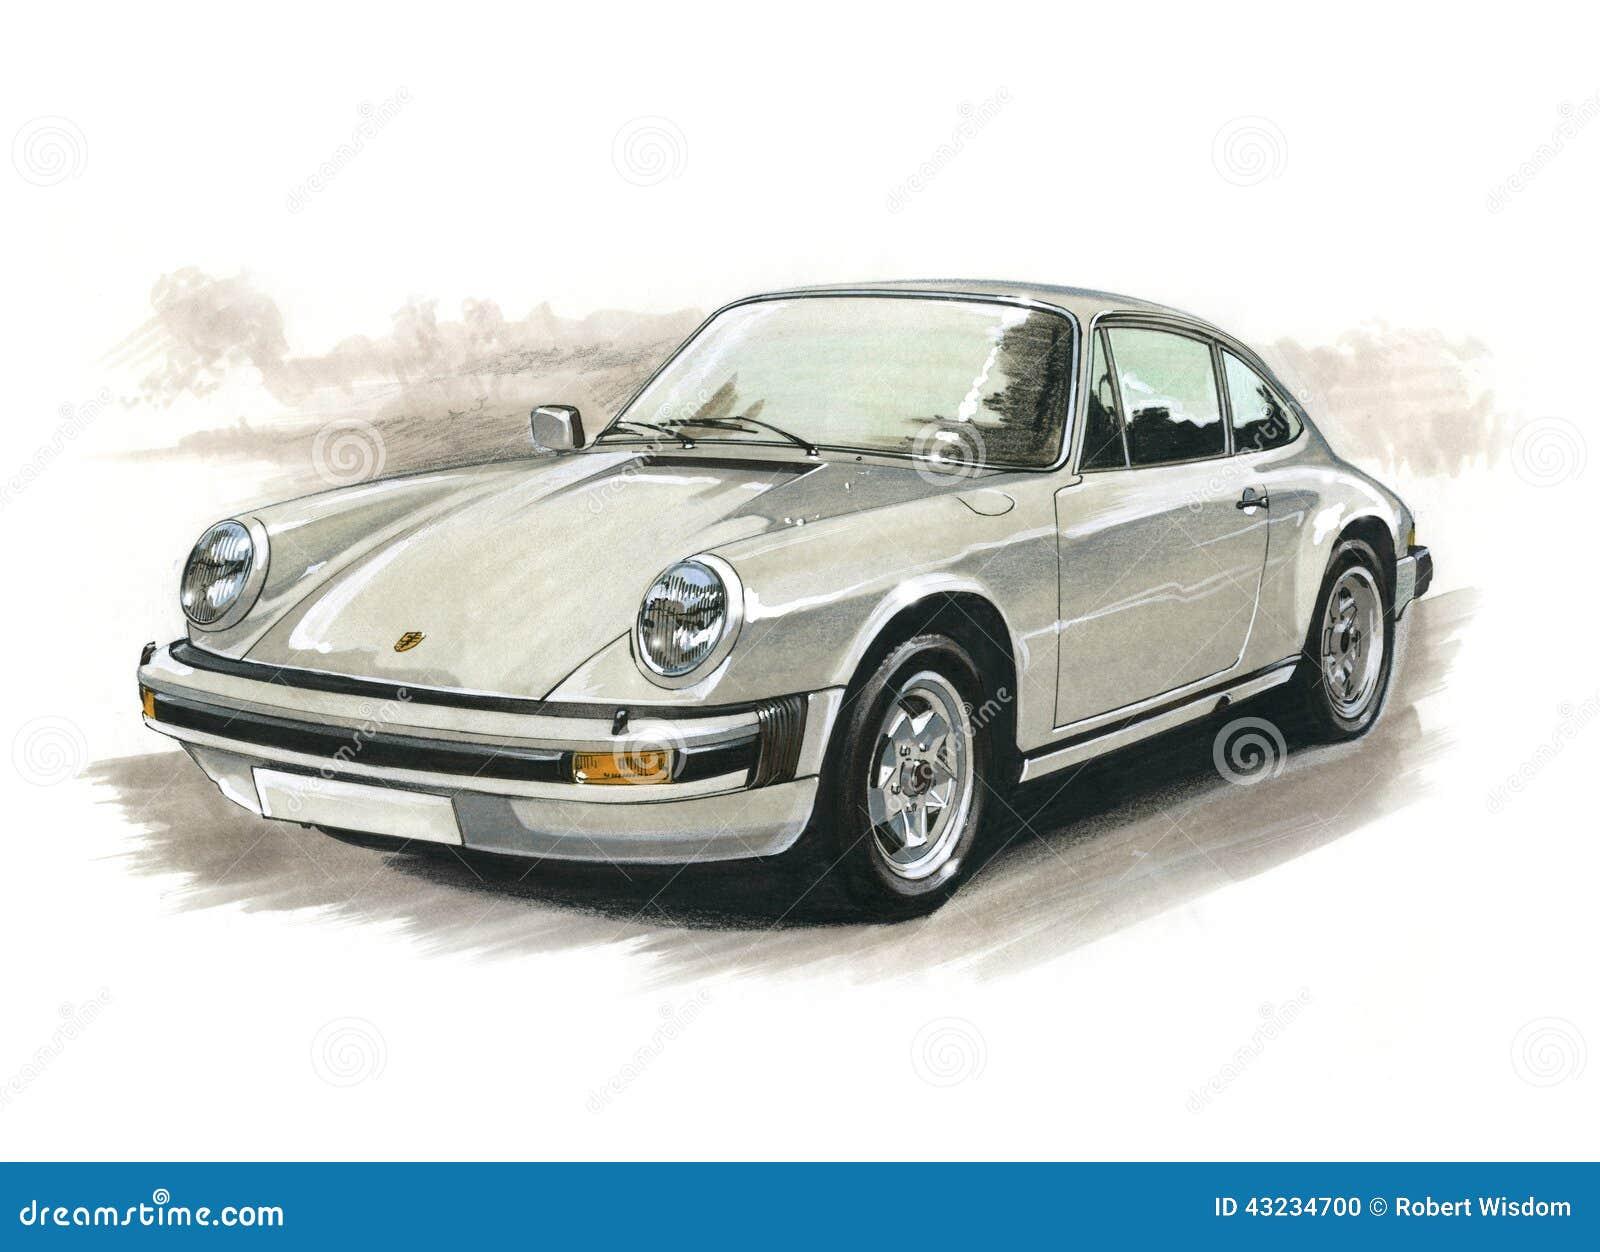 Porsche 911 Carrera Editorial Image Image 43234700